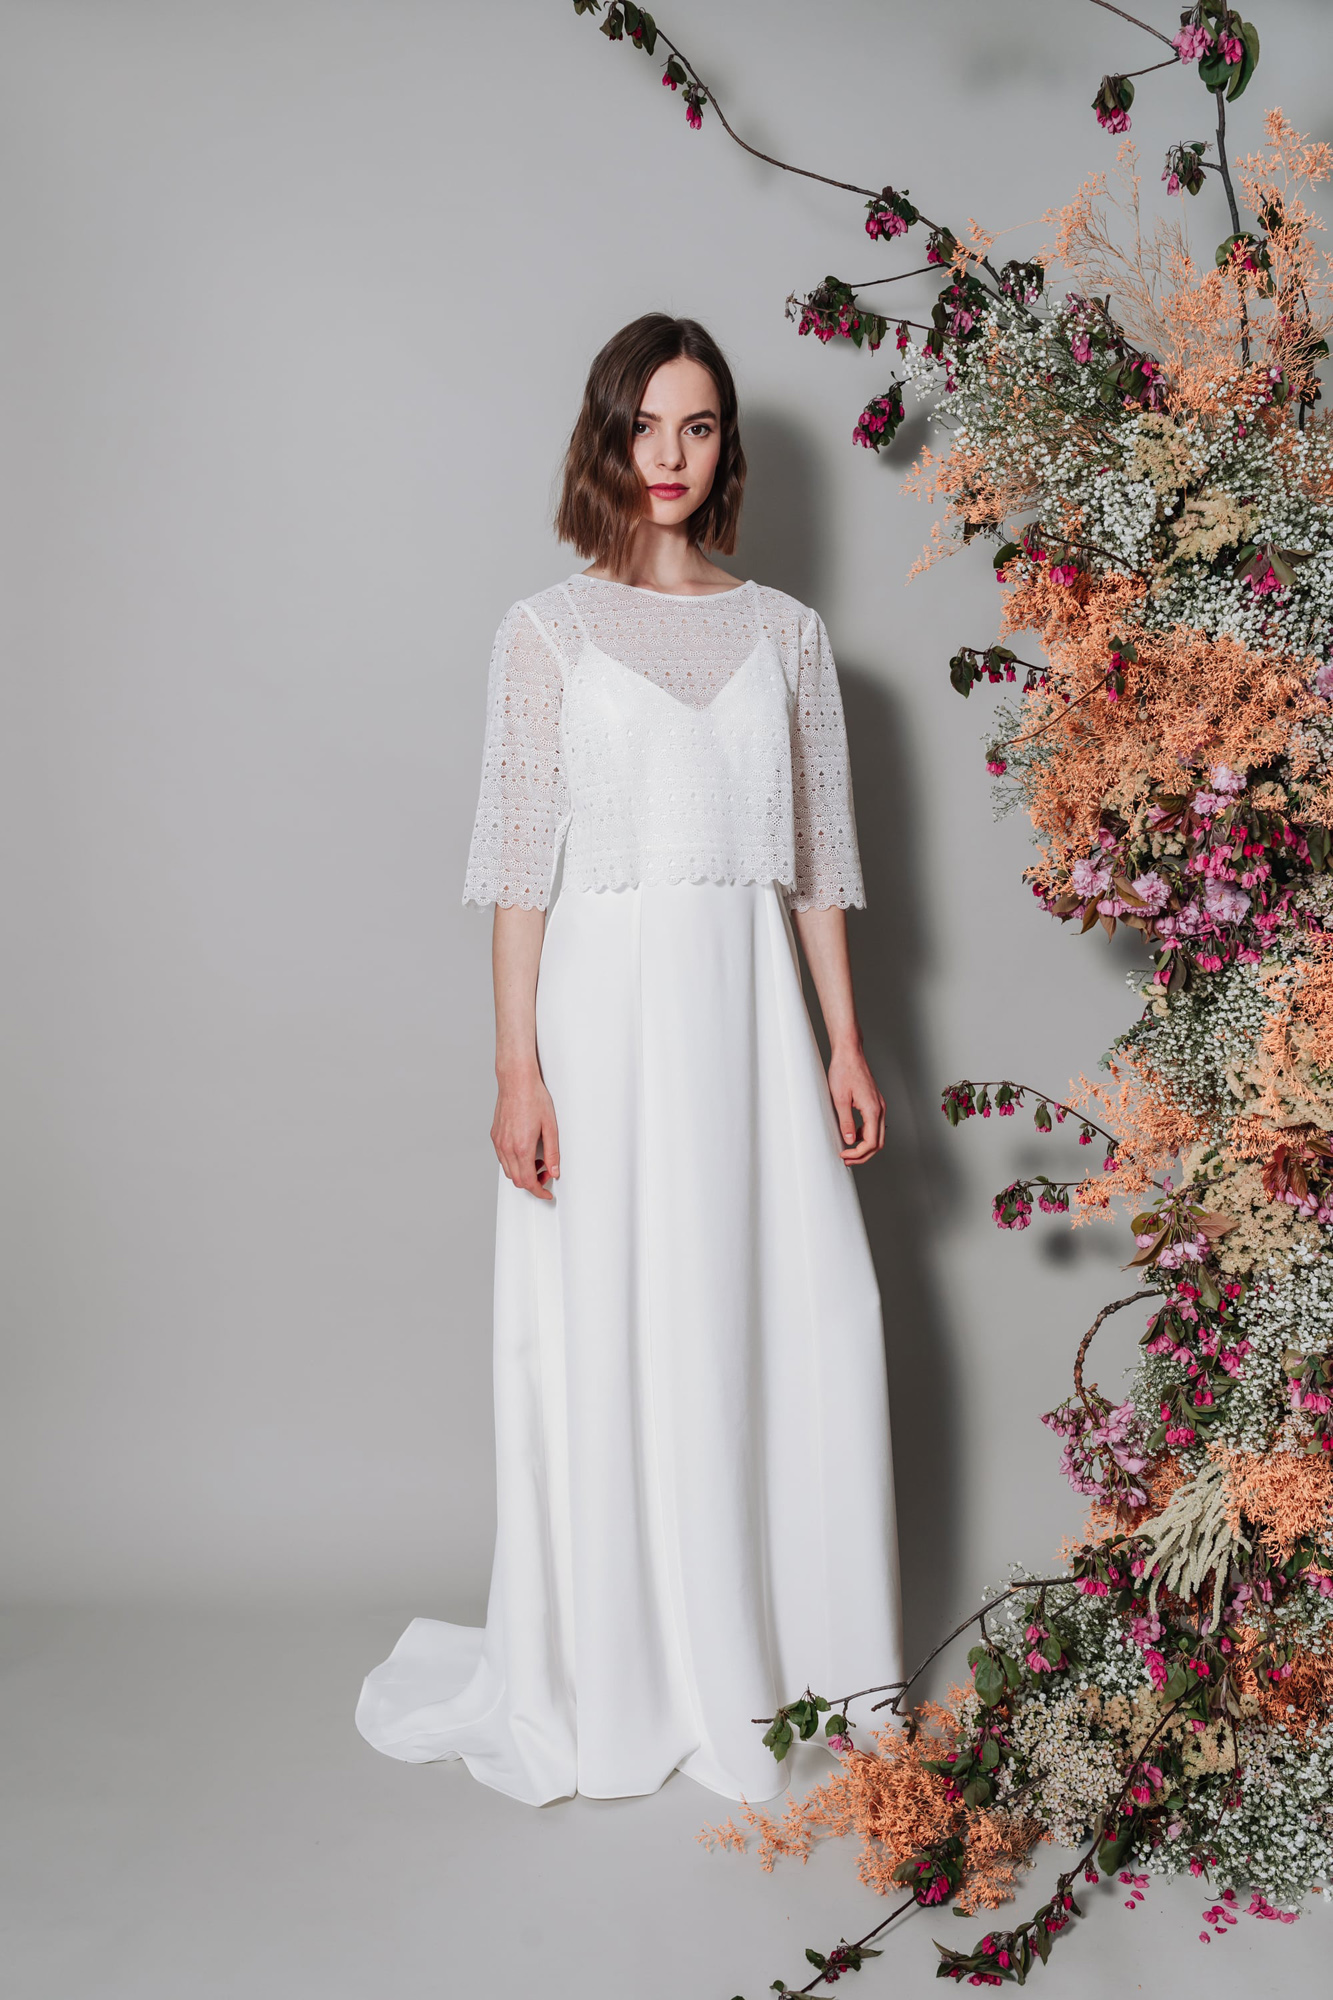 Kate-Beaumont-Sheffield-Freesia-Guipure-Lace-Jacket-Snowdrop-Minimal-Modern-Elegant-Matt-Silk-Wedding-Gown-4.jpg